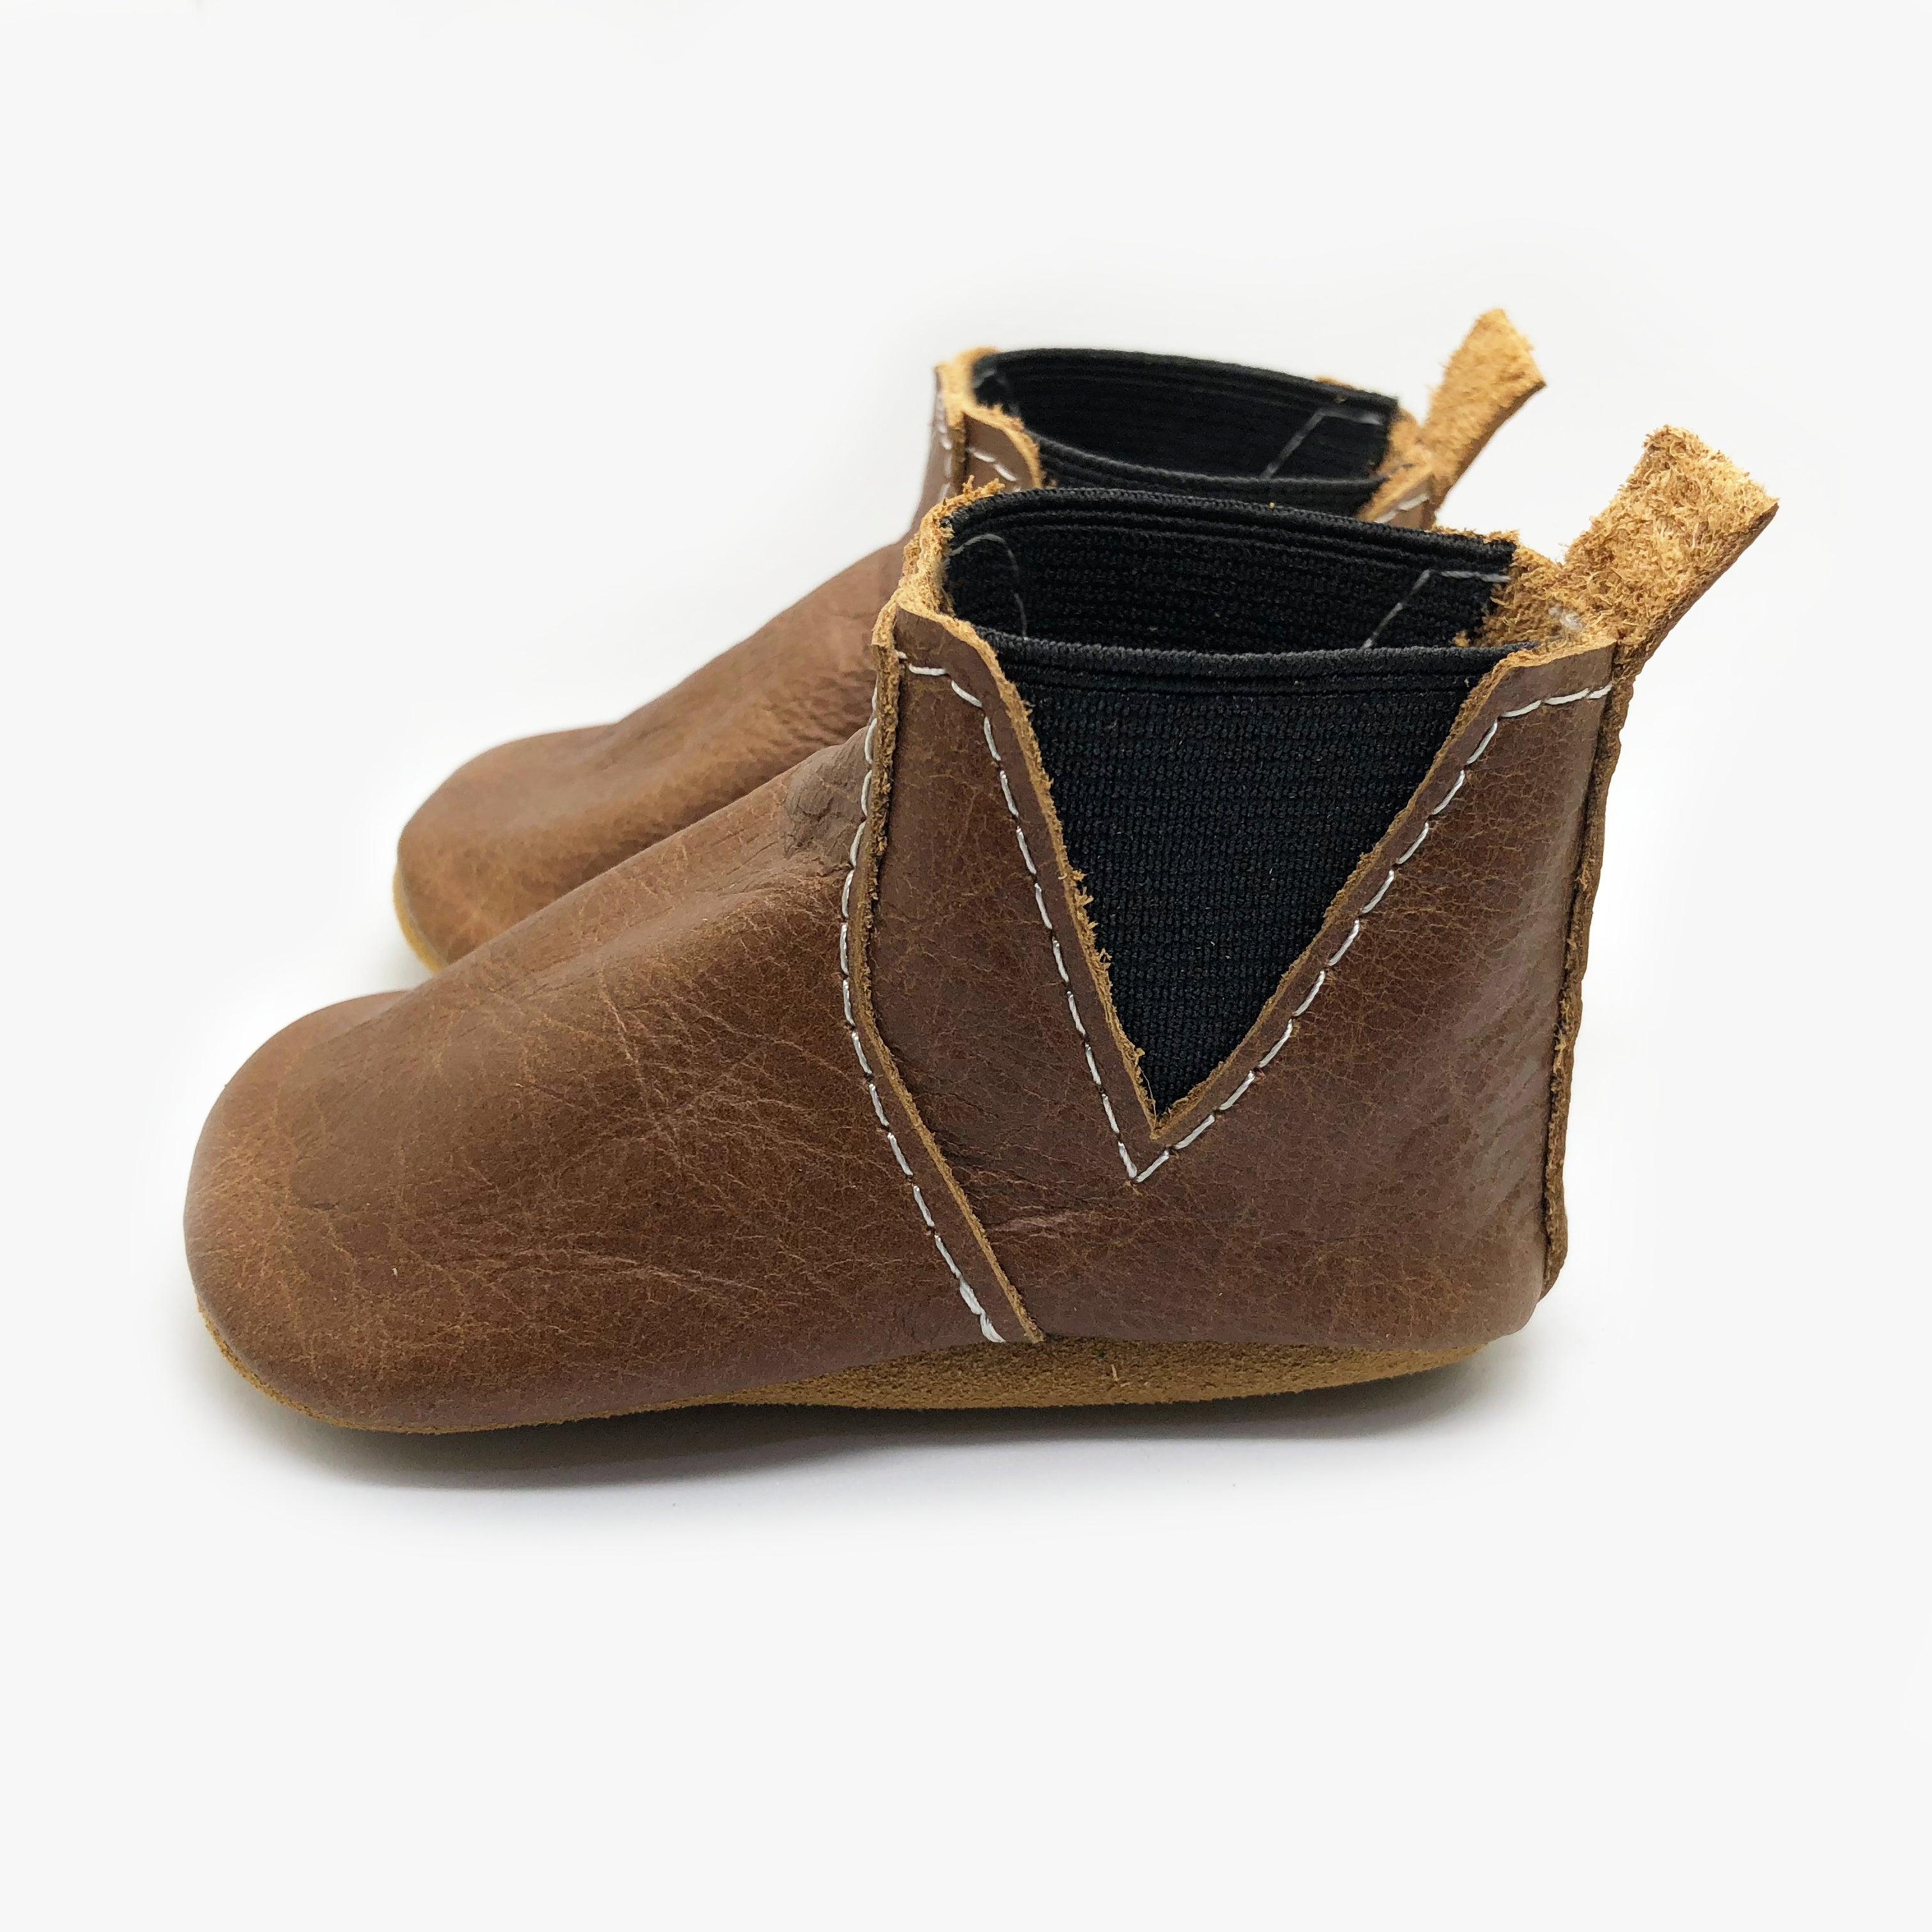 Brandy Chelsea Boots